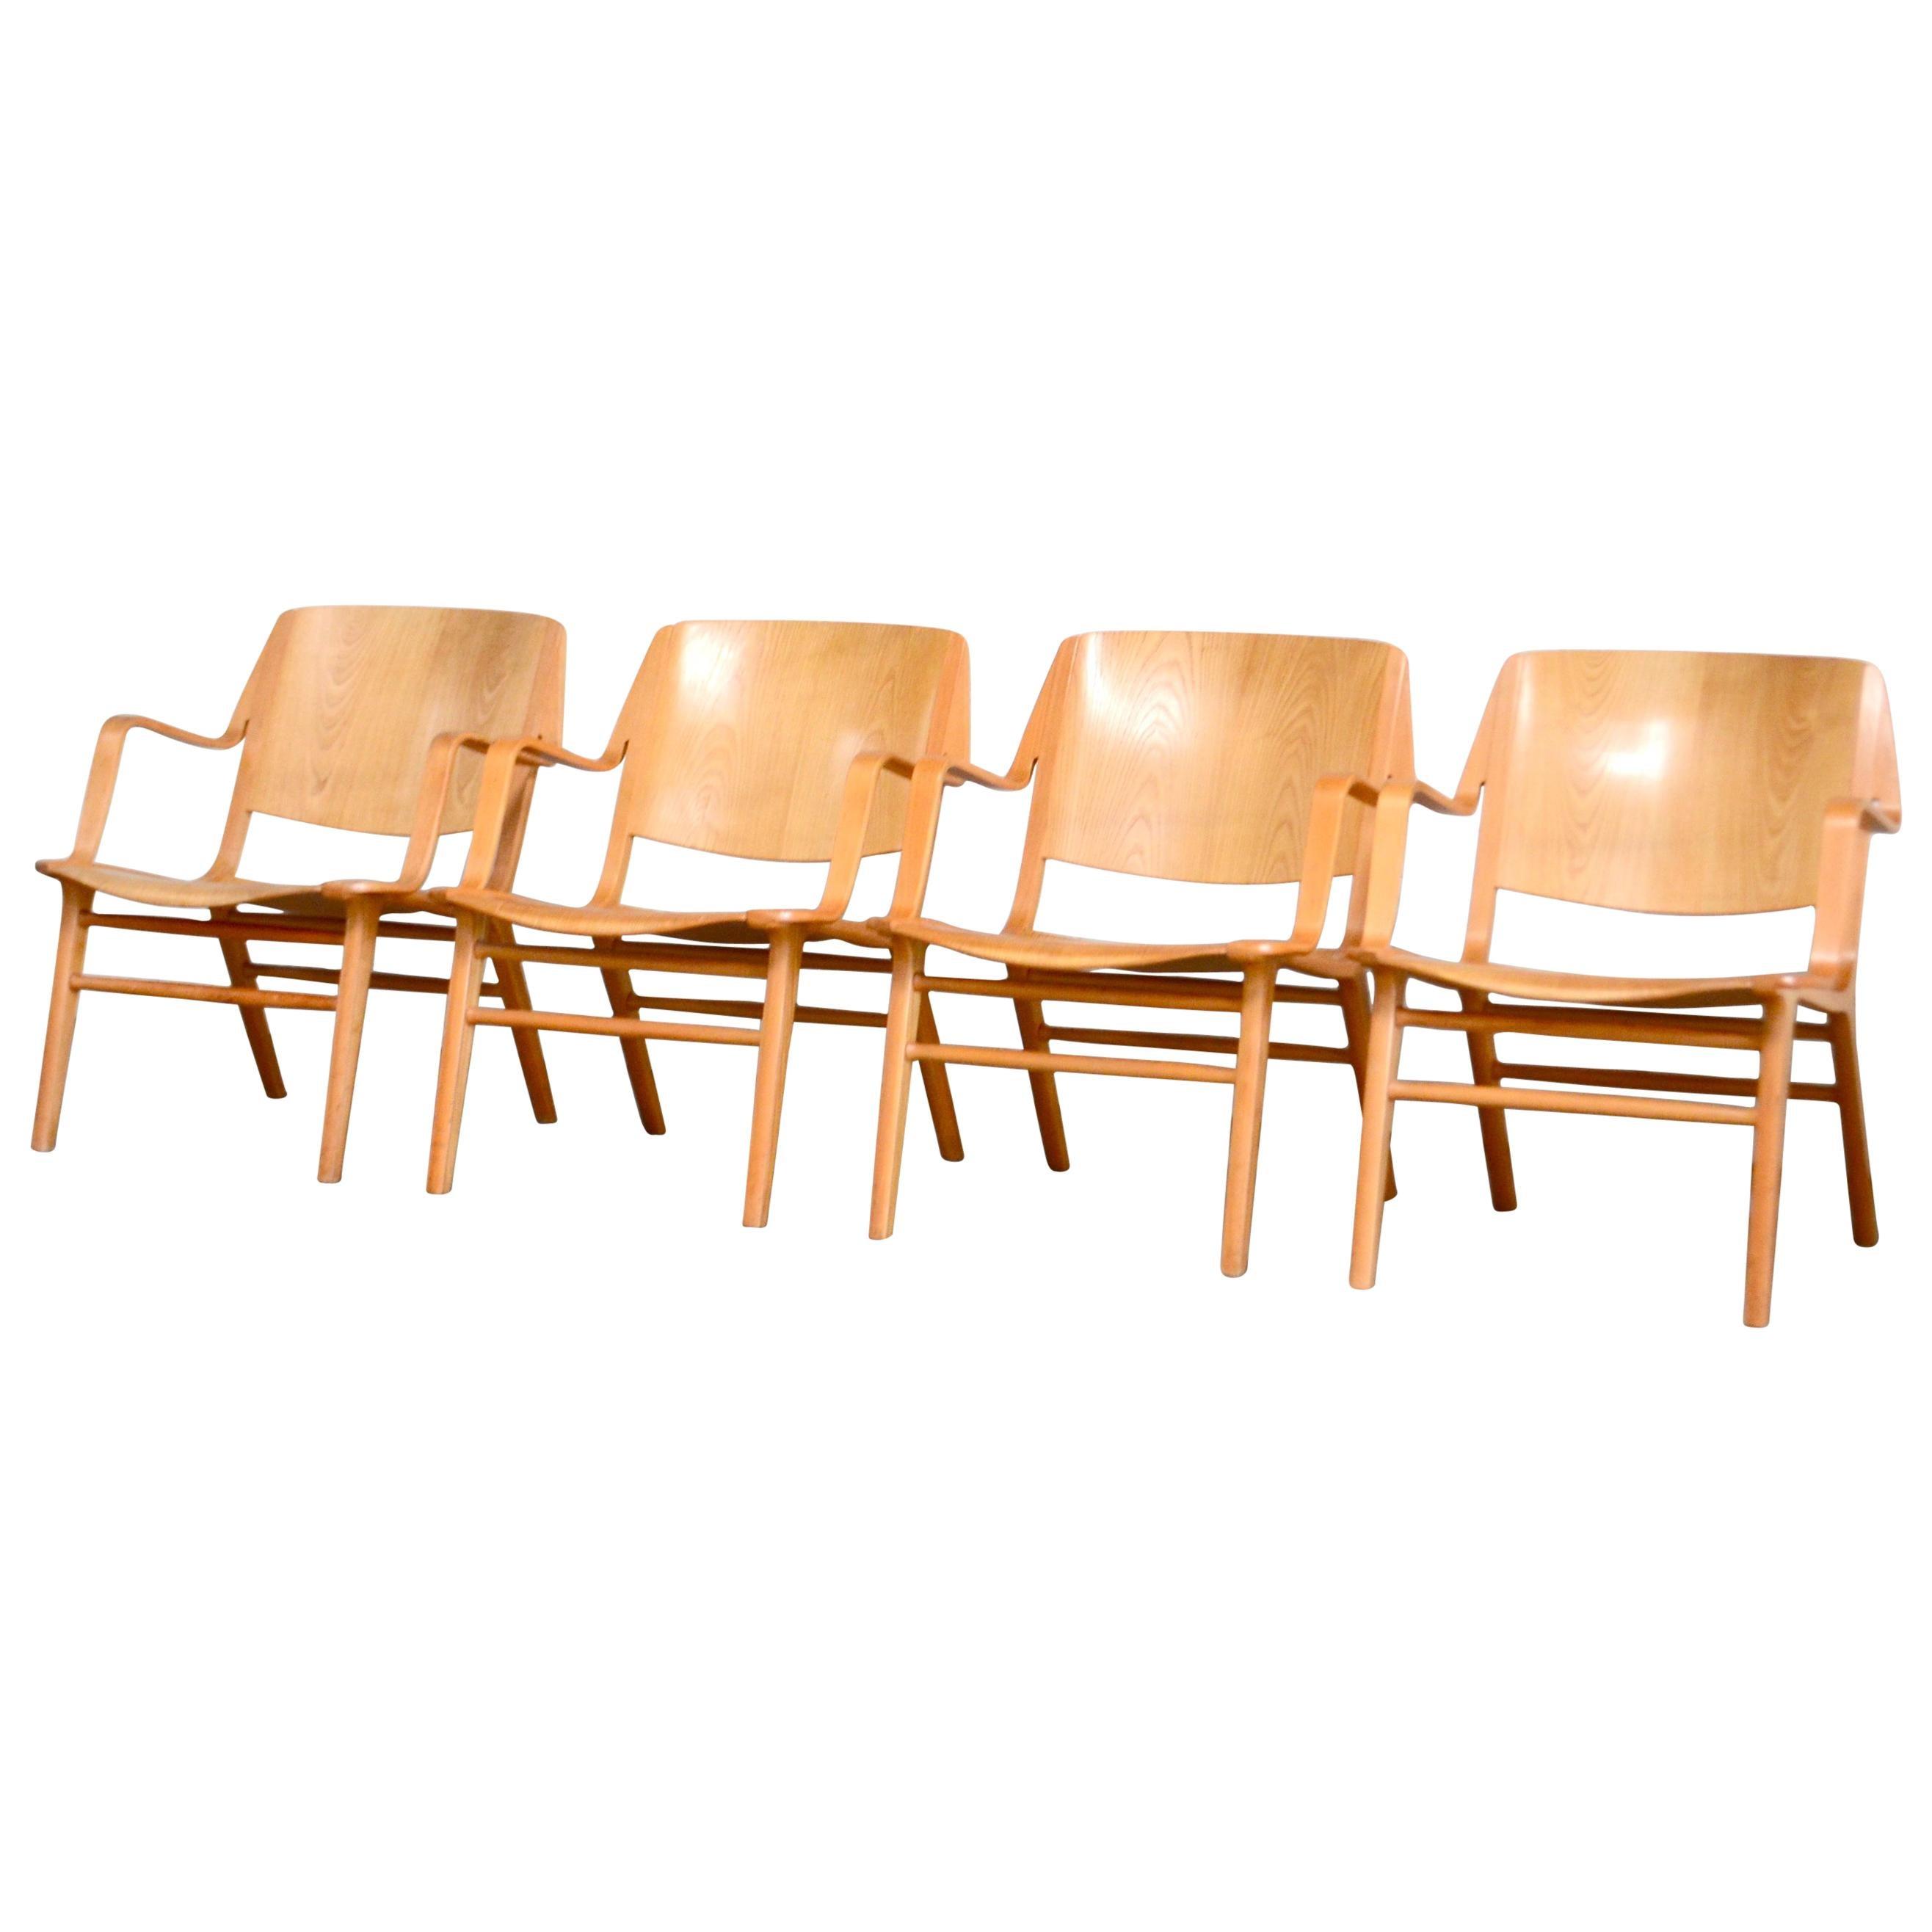 Peter Hvidt and Orla Mølgaard-Nielsen Ax Lounge Chair for Fritz Hansen